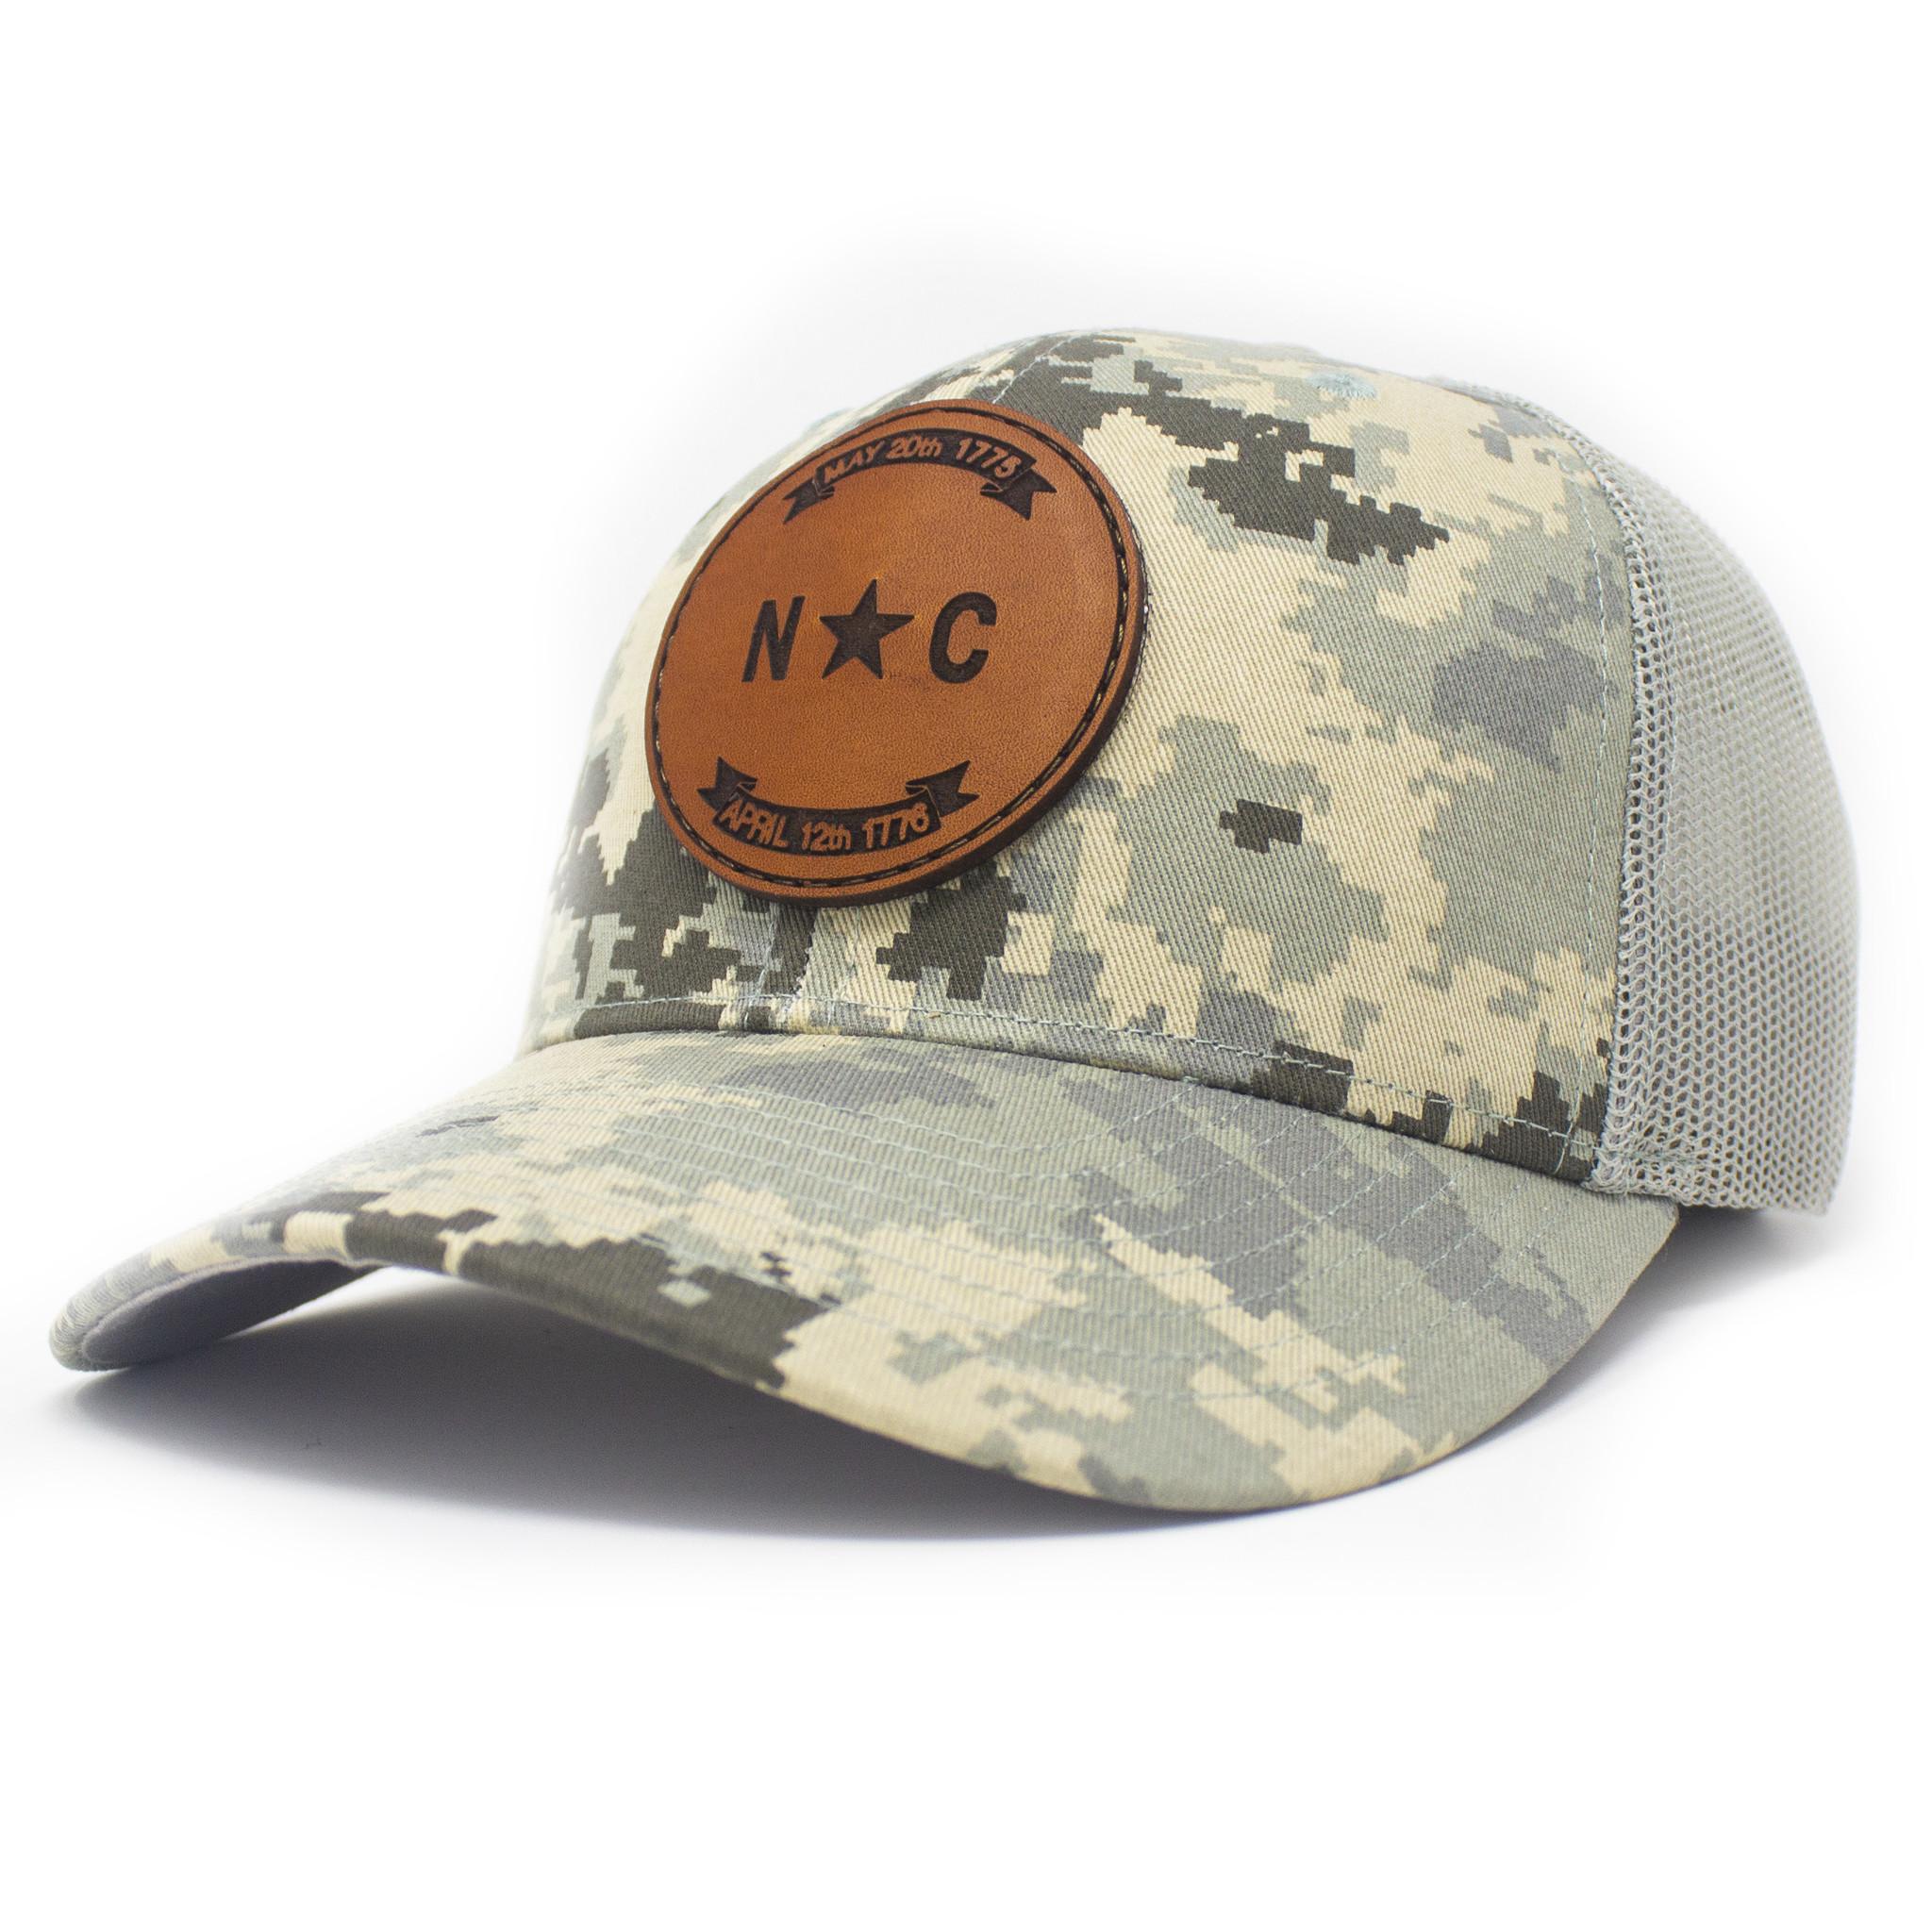 North Carolina Flag Patch Trucker Hat Military Digital Camo/Light Green-1